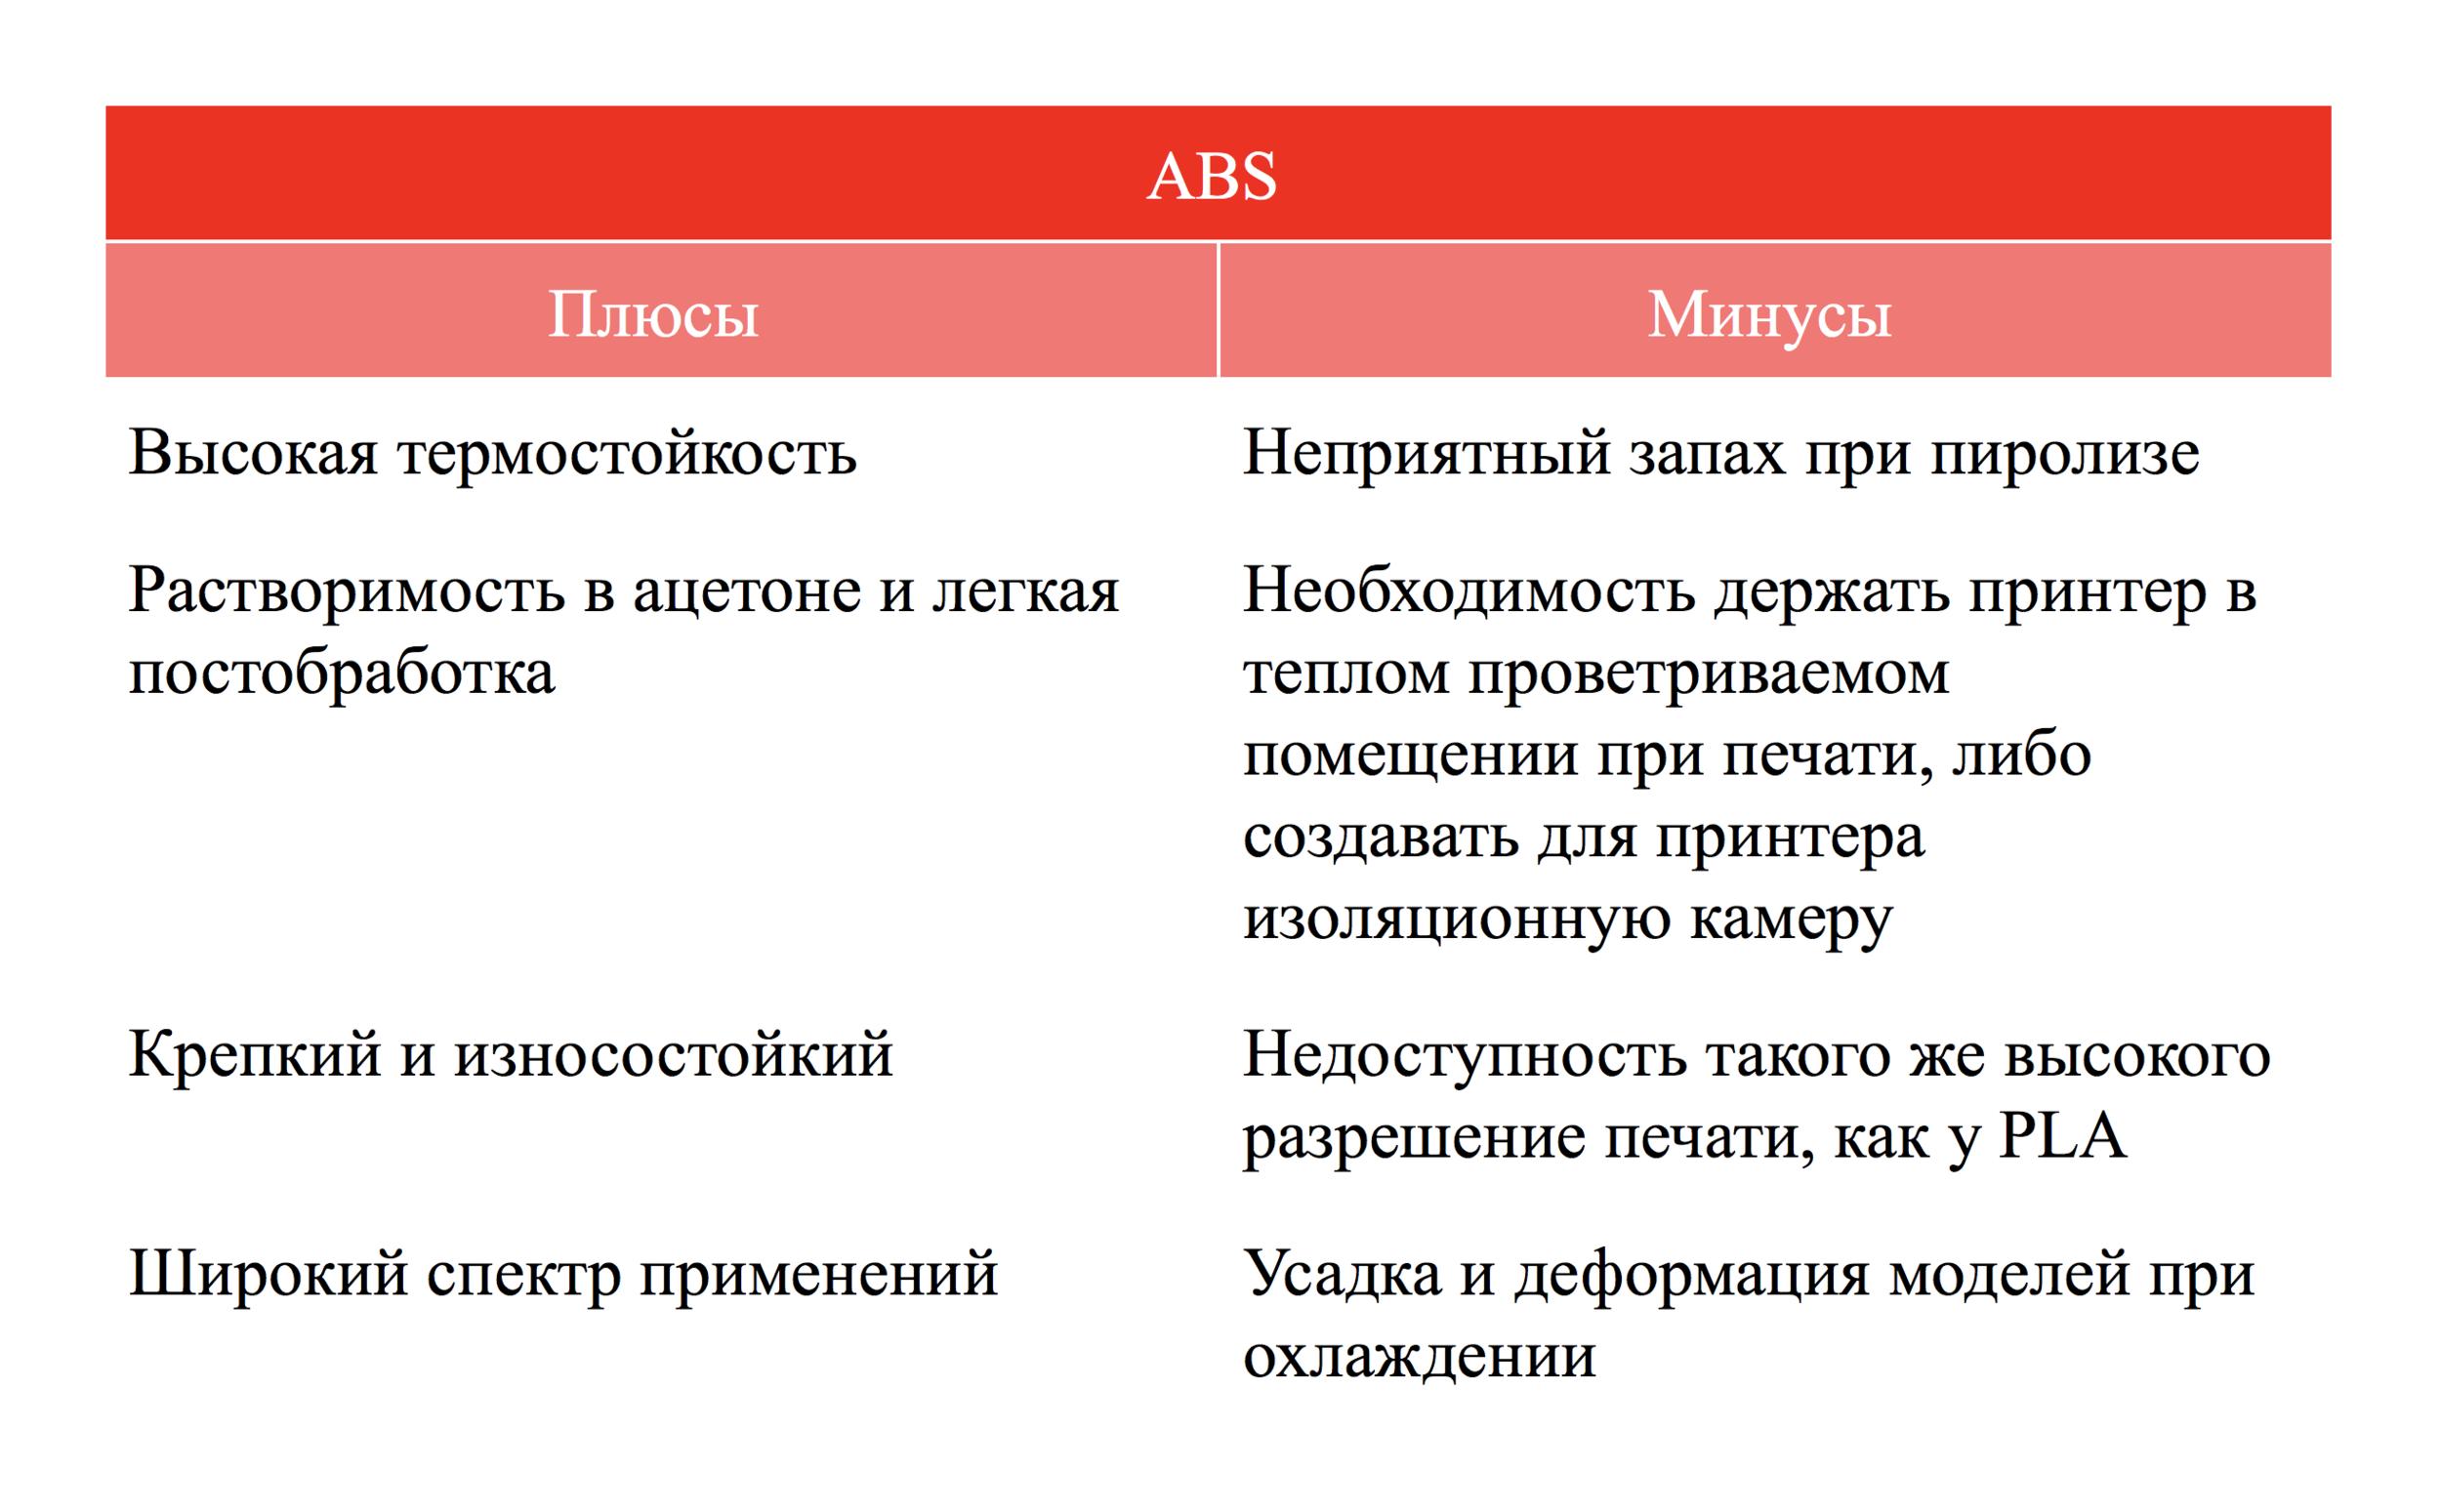 Плюсы и минусы ABS пластика qbed.space.png